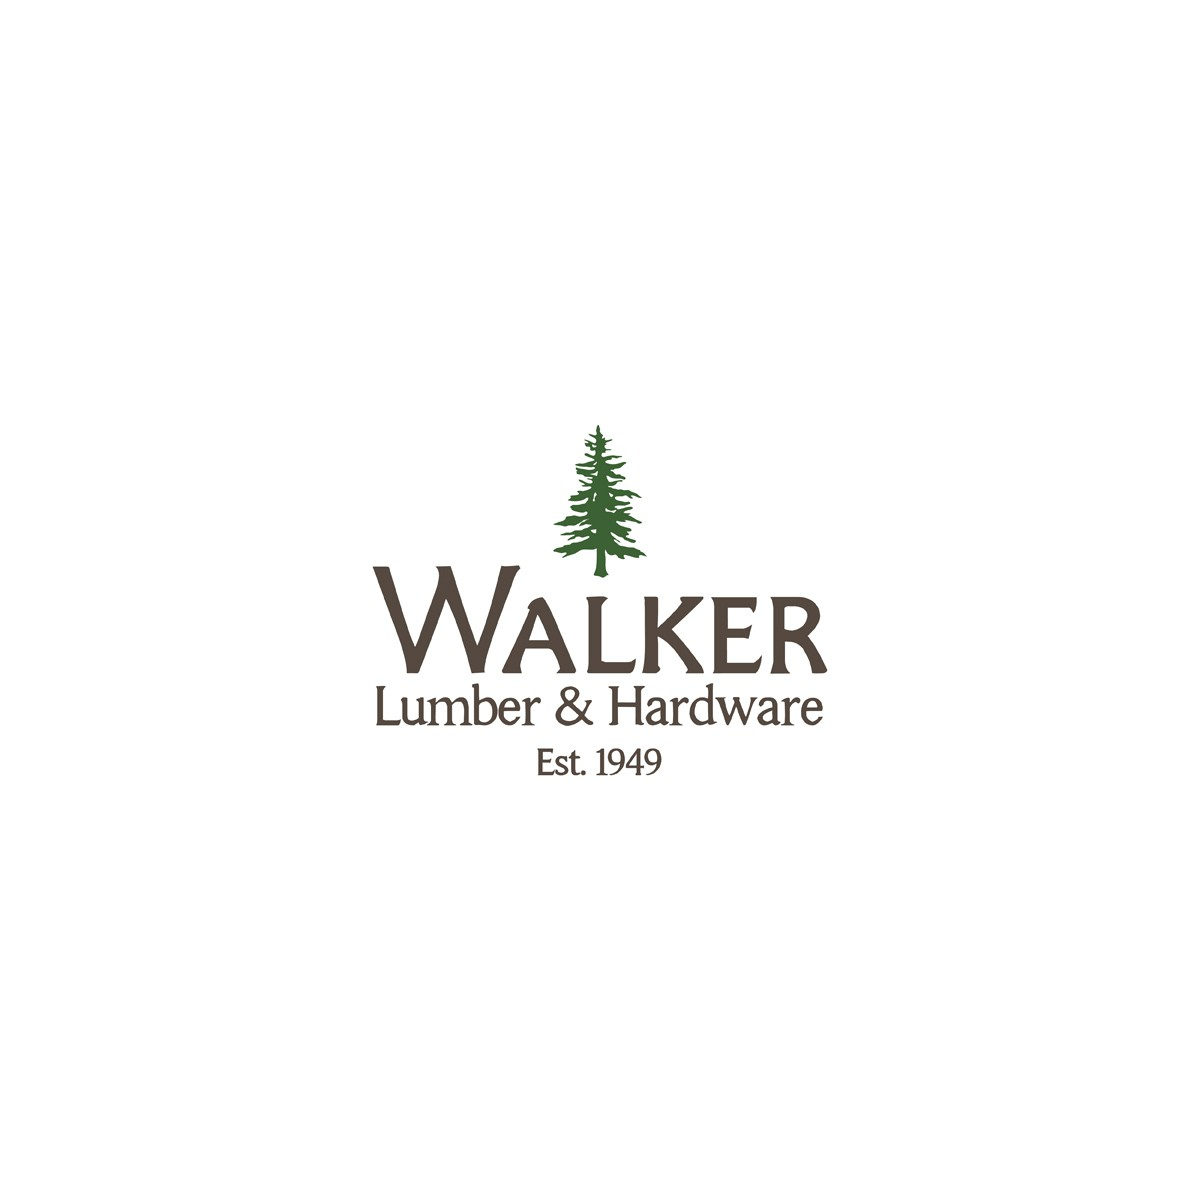 Logo update/tweak